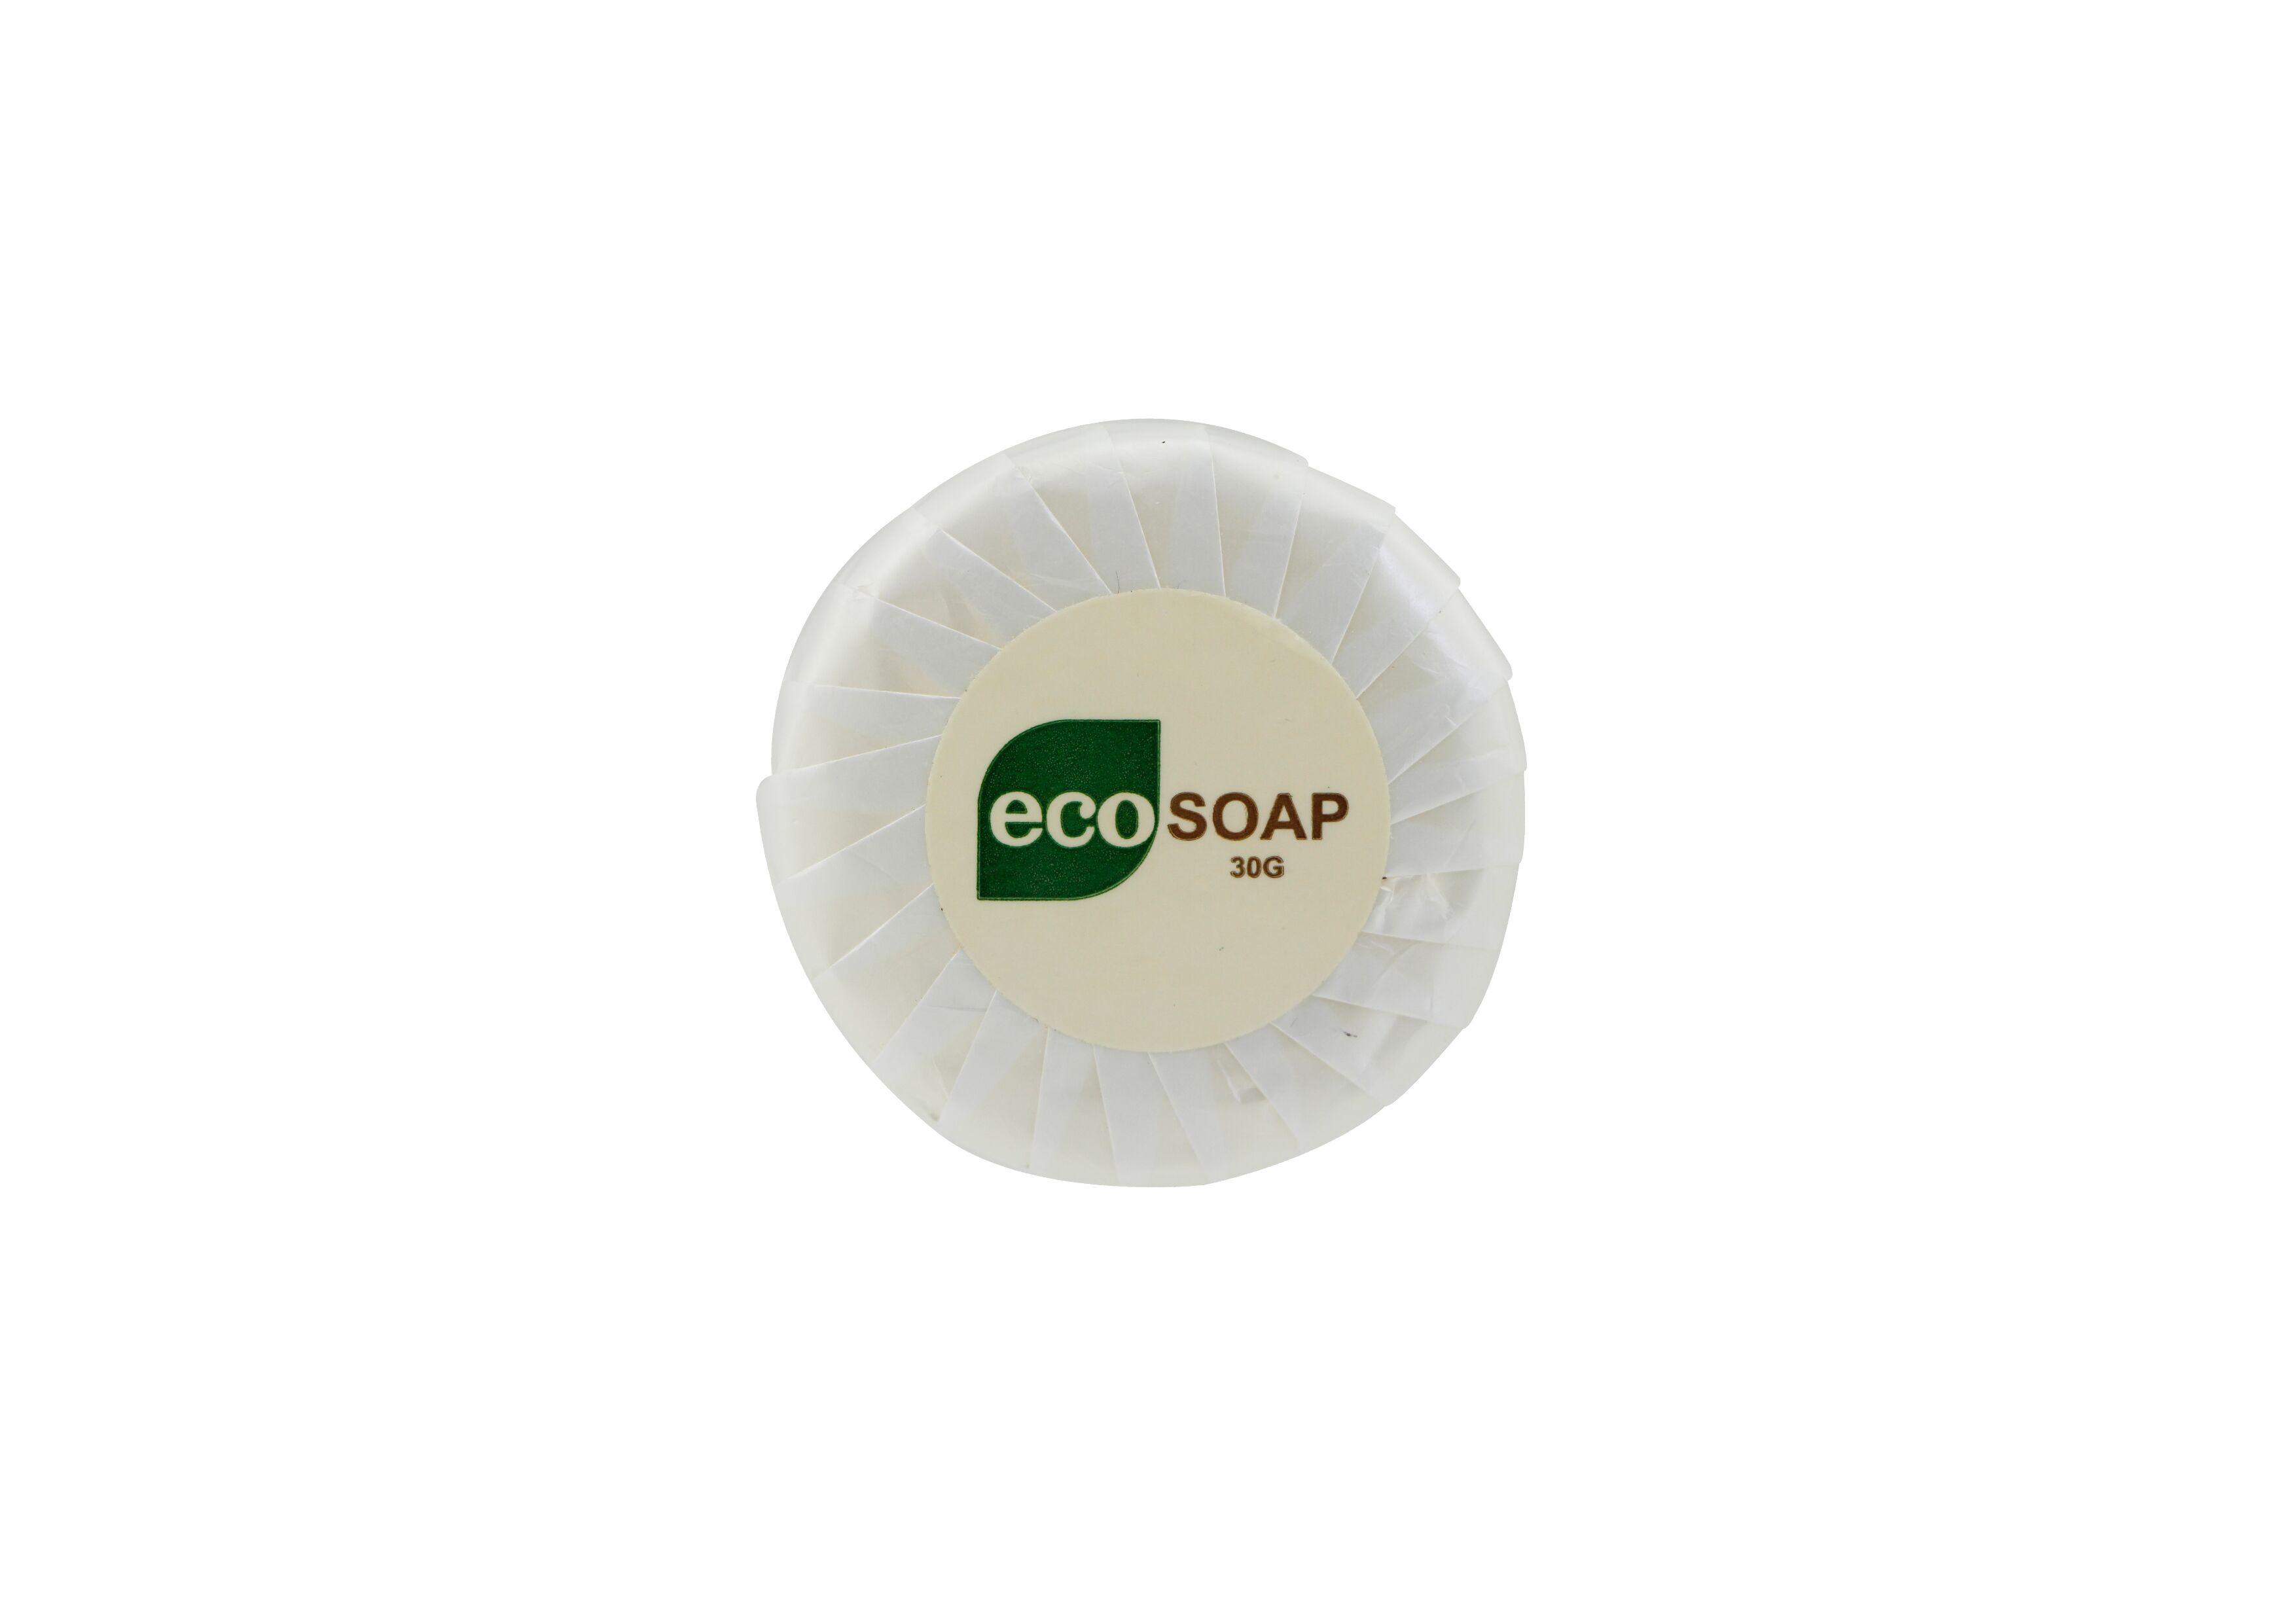 30g ECO Bath Soap